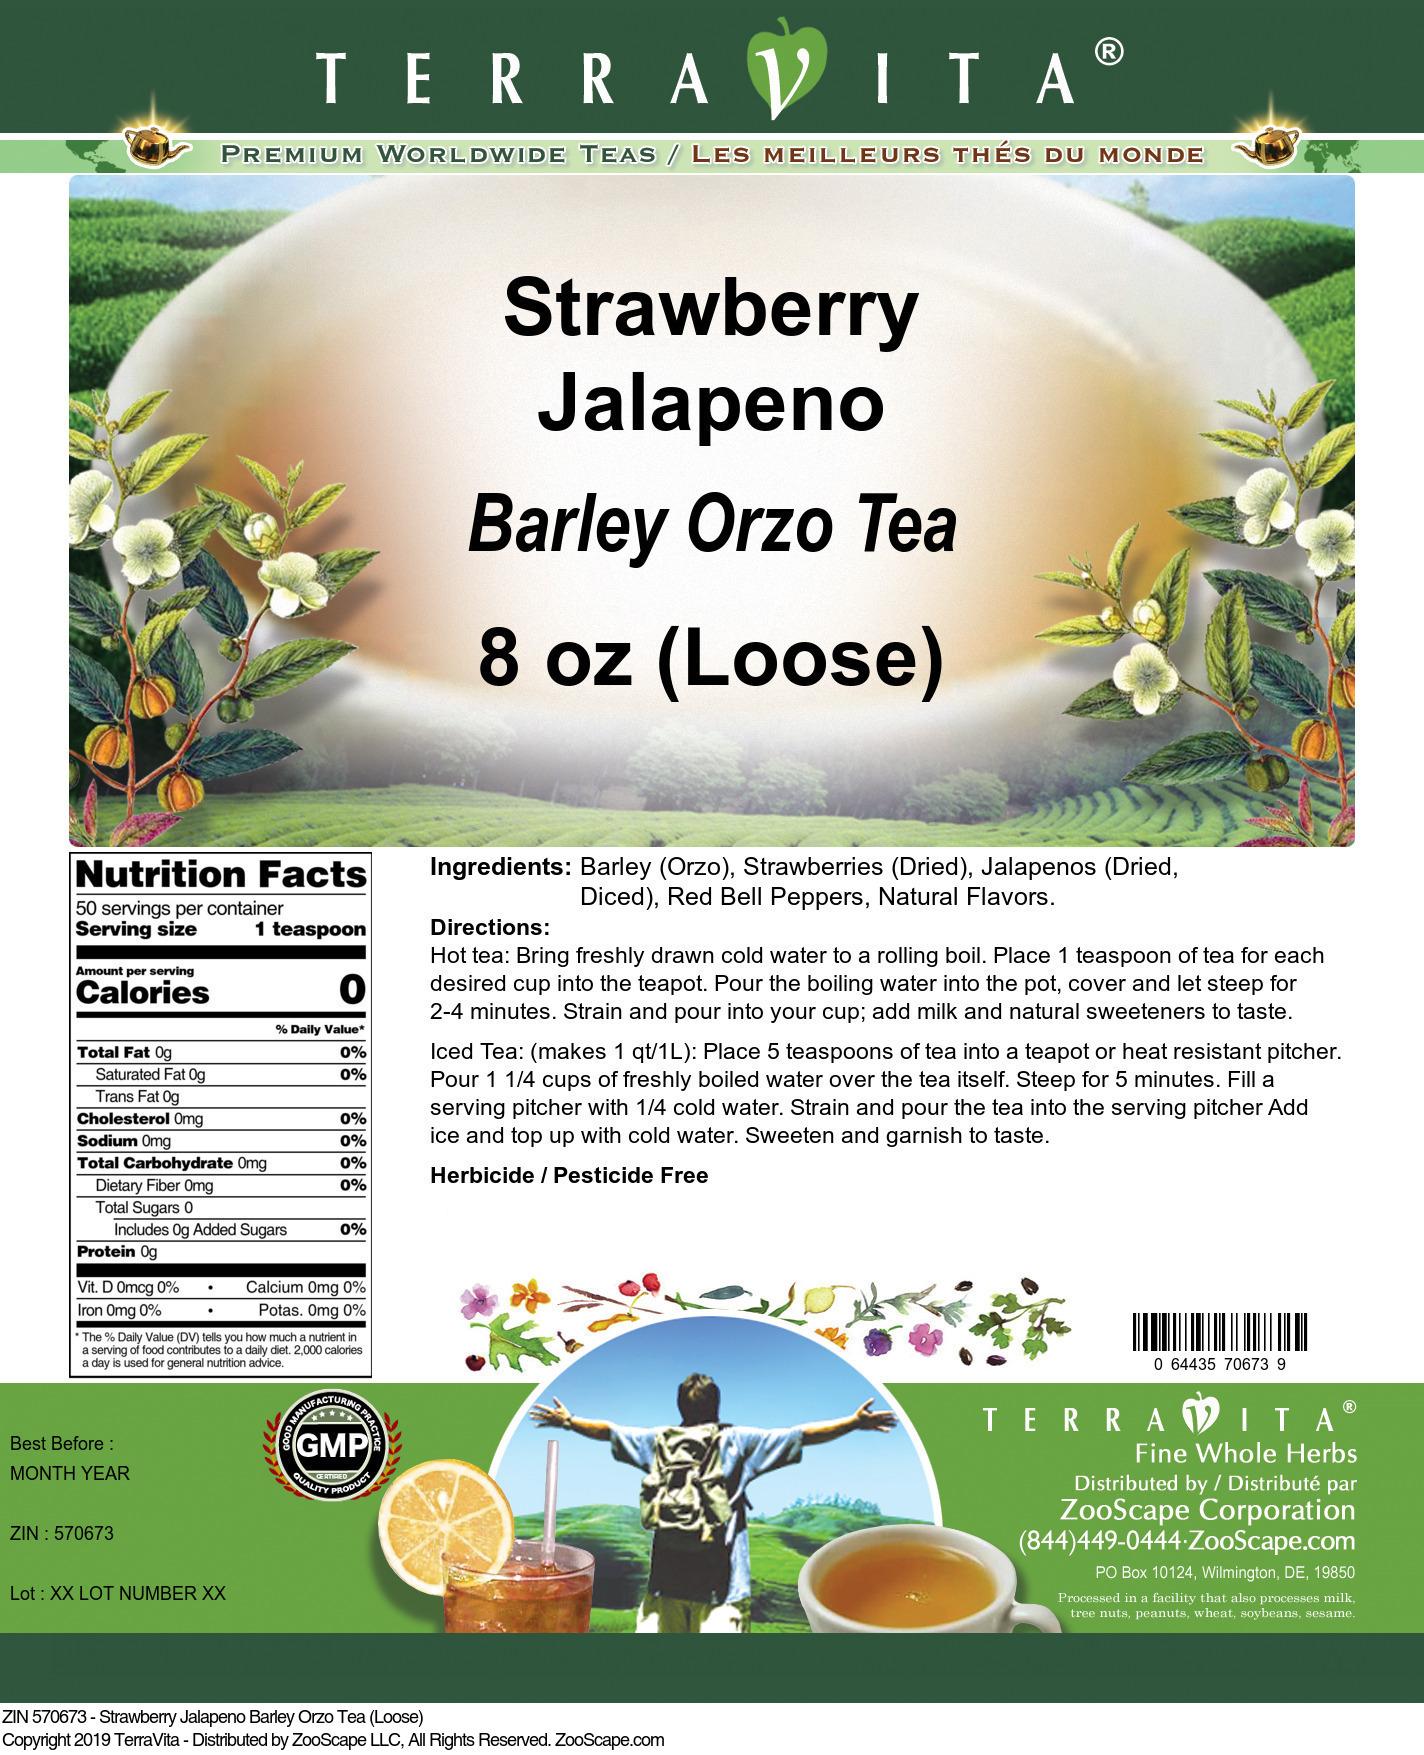 Strawberry Jalapeno Barley Orzo Tea (Loose)